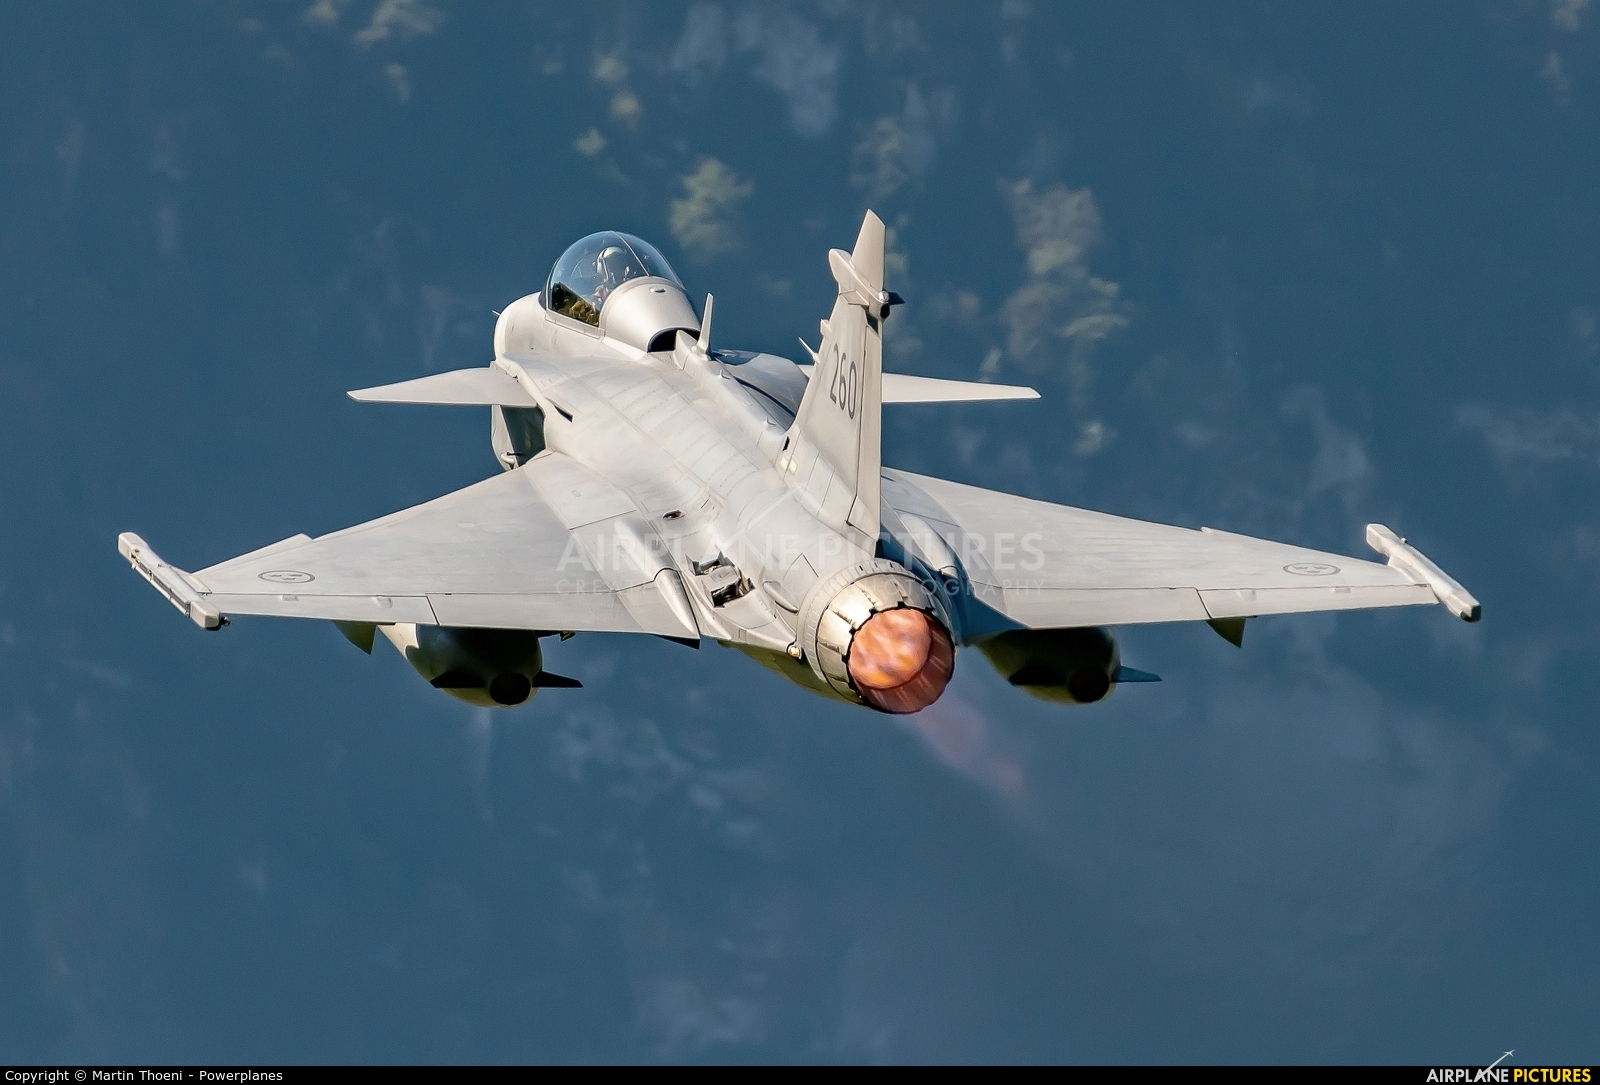 Sweden - Air Force 39260 aircraft at Mollis